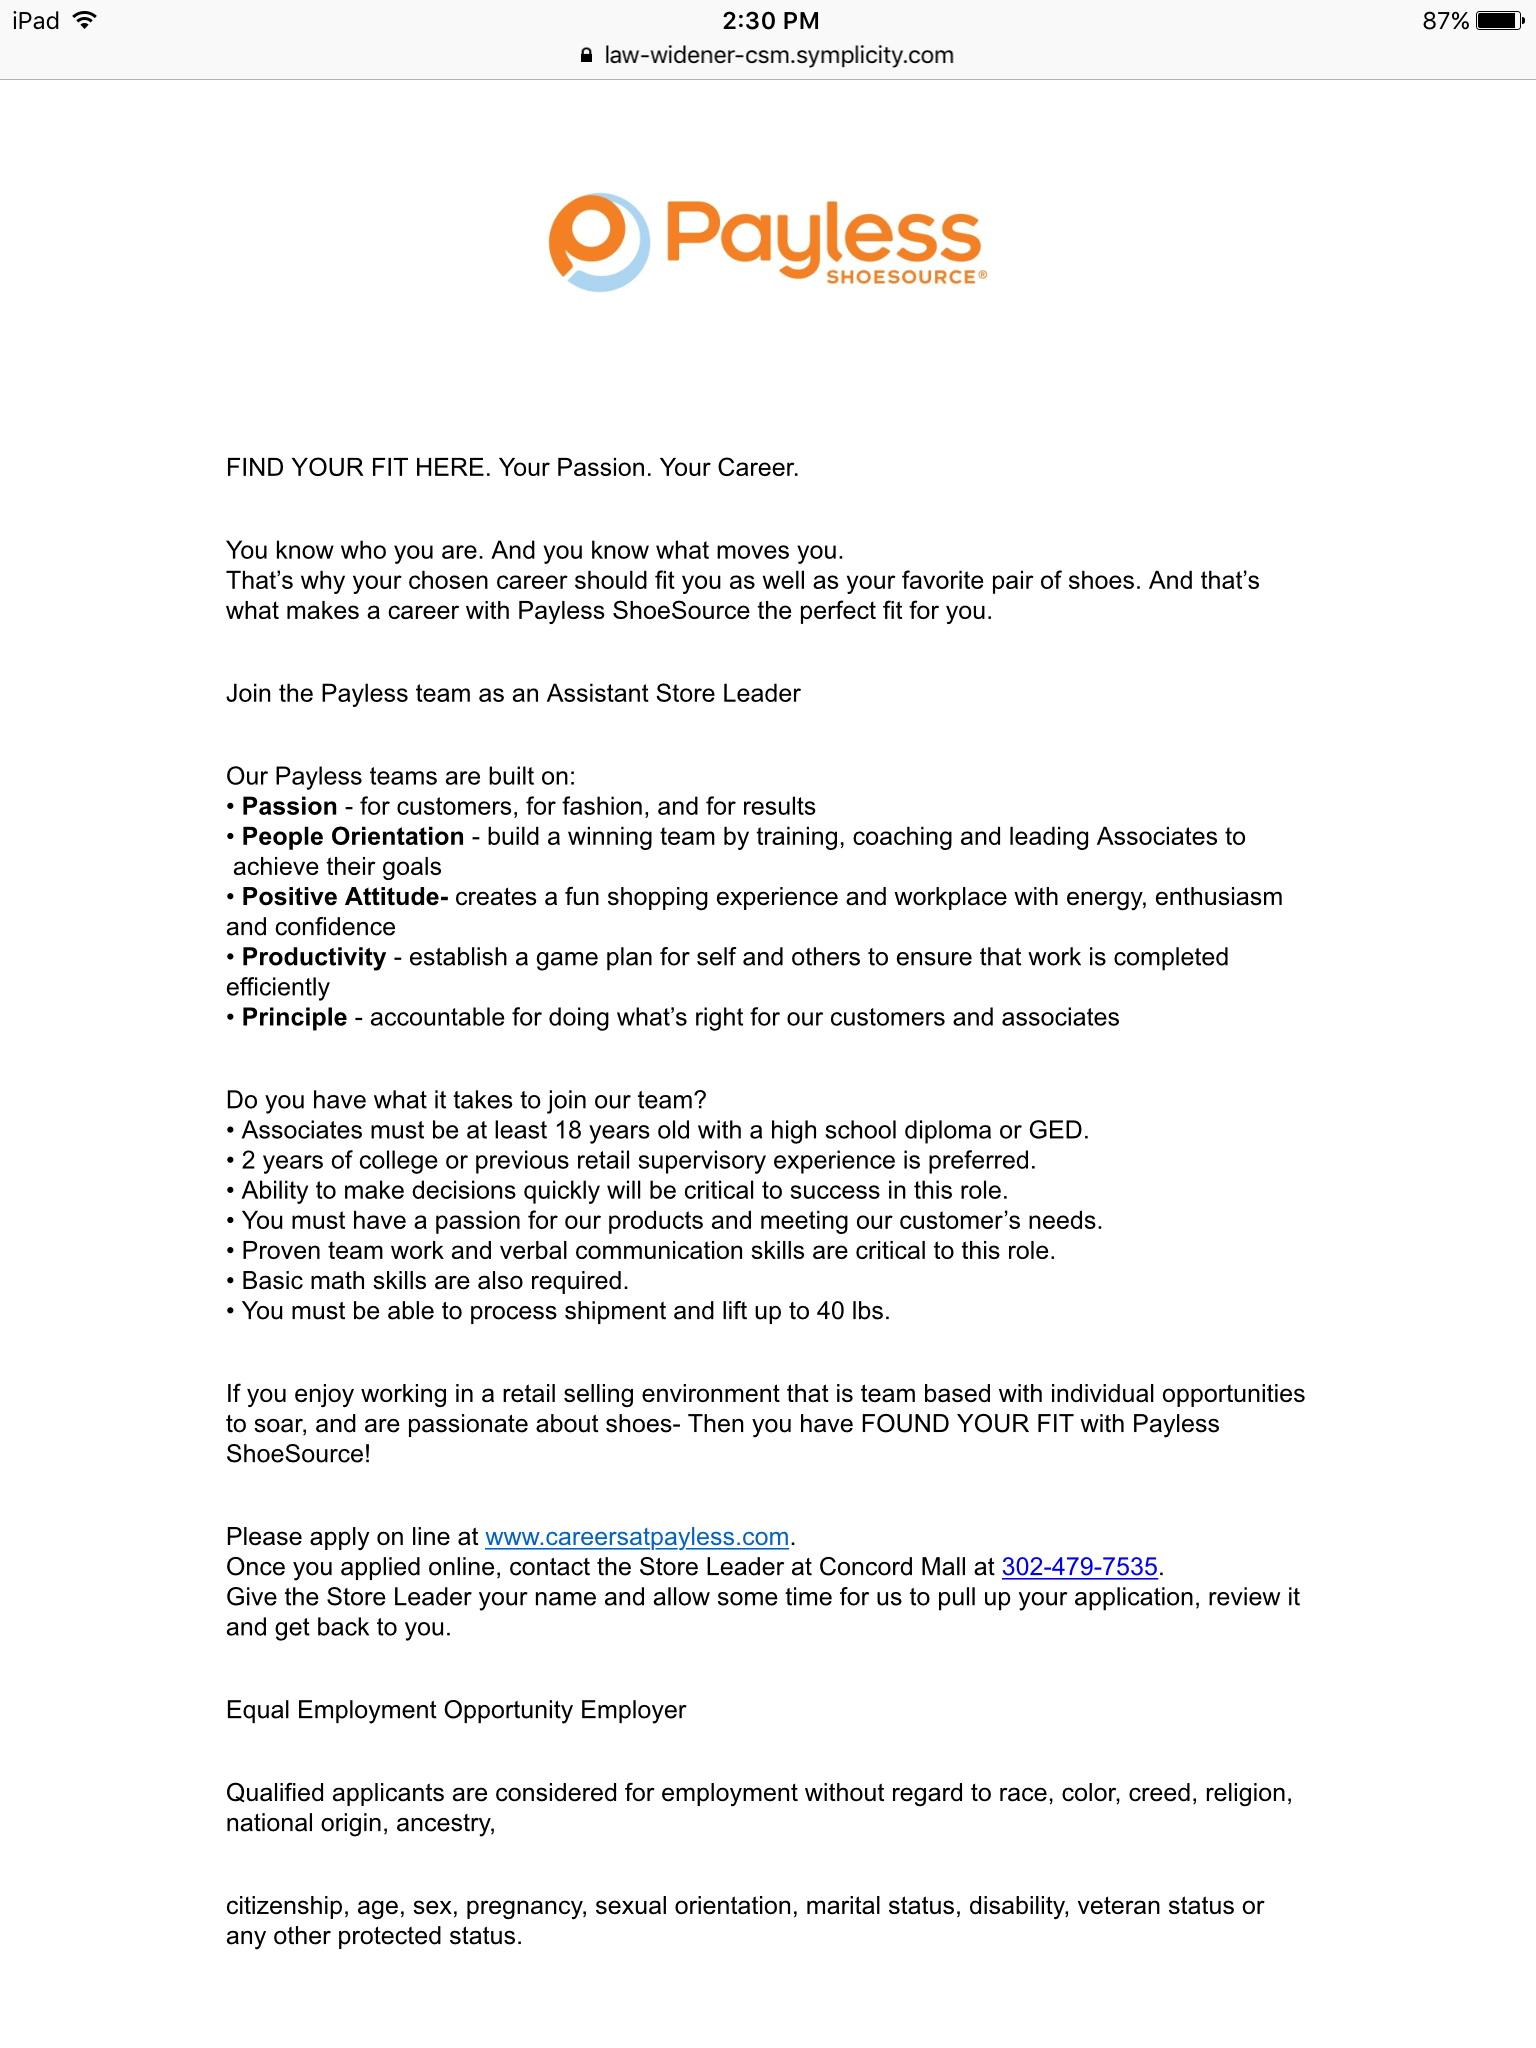 Payless Shoesource Job Application Pdf